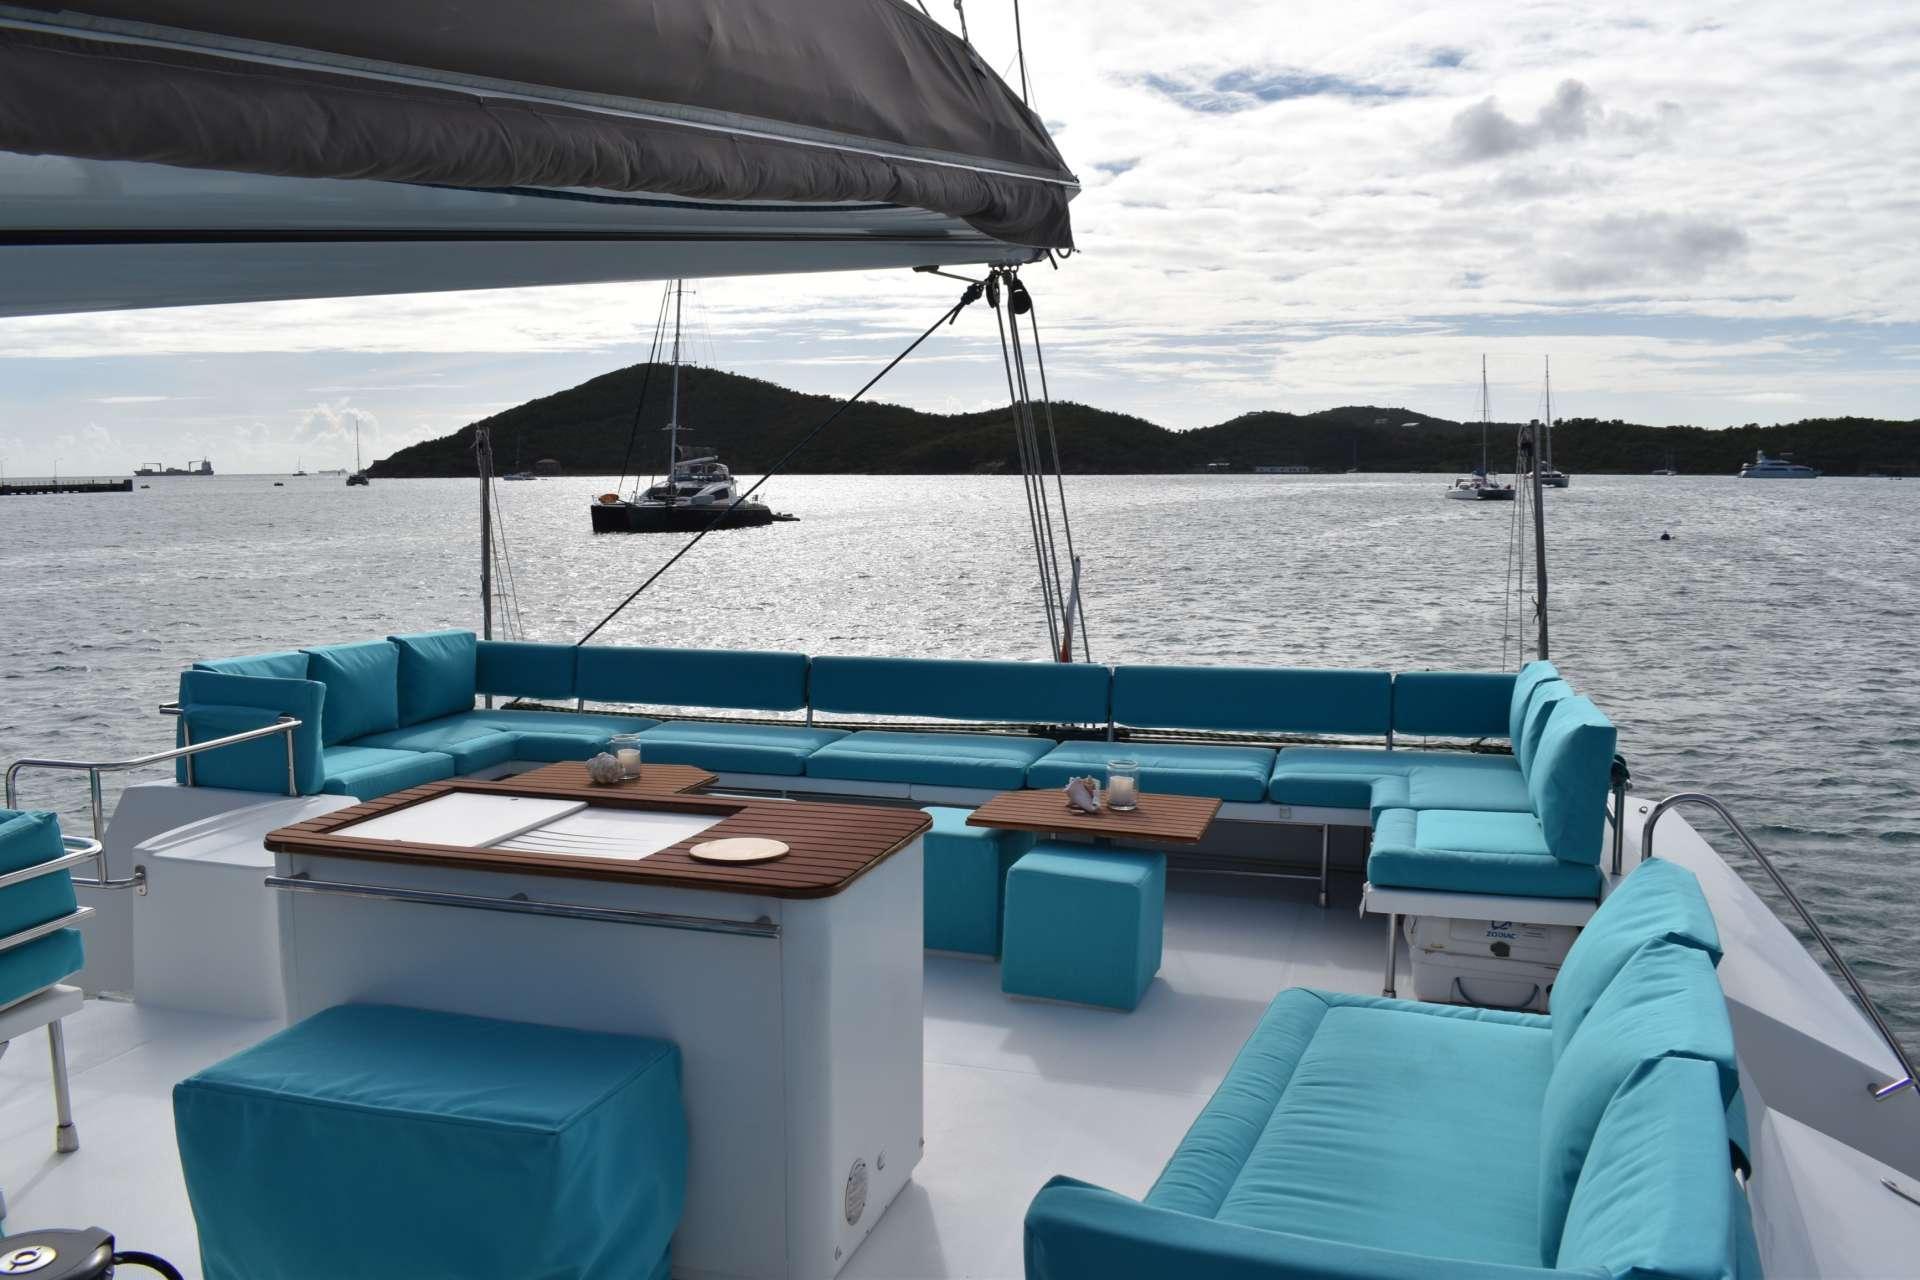 Image of LIR yacht #11